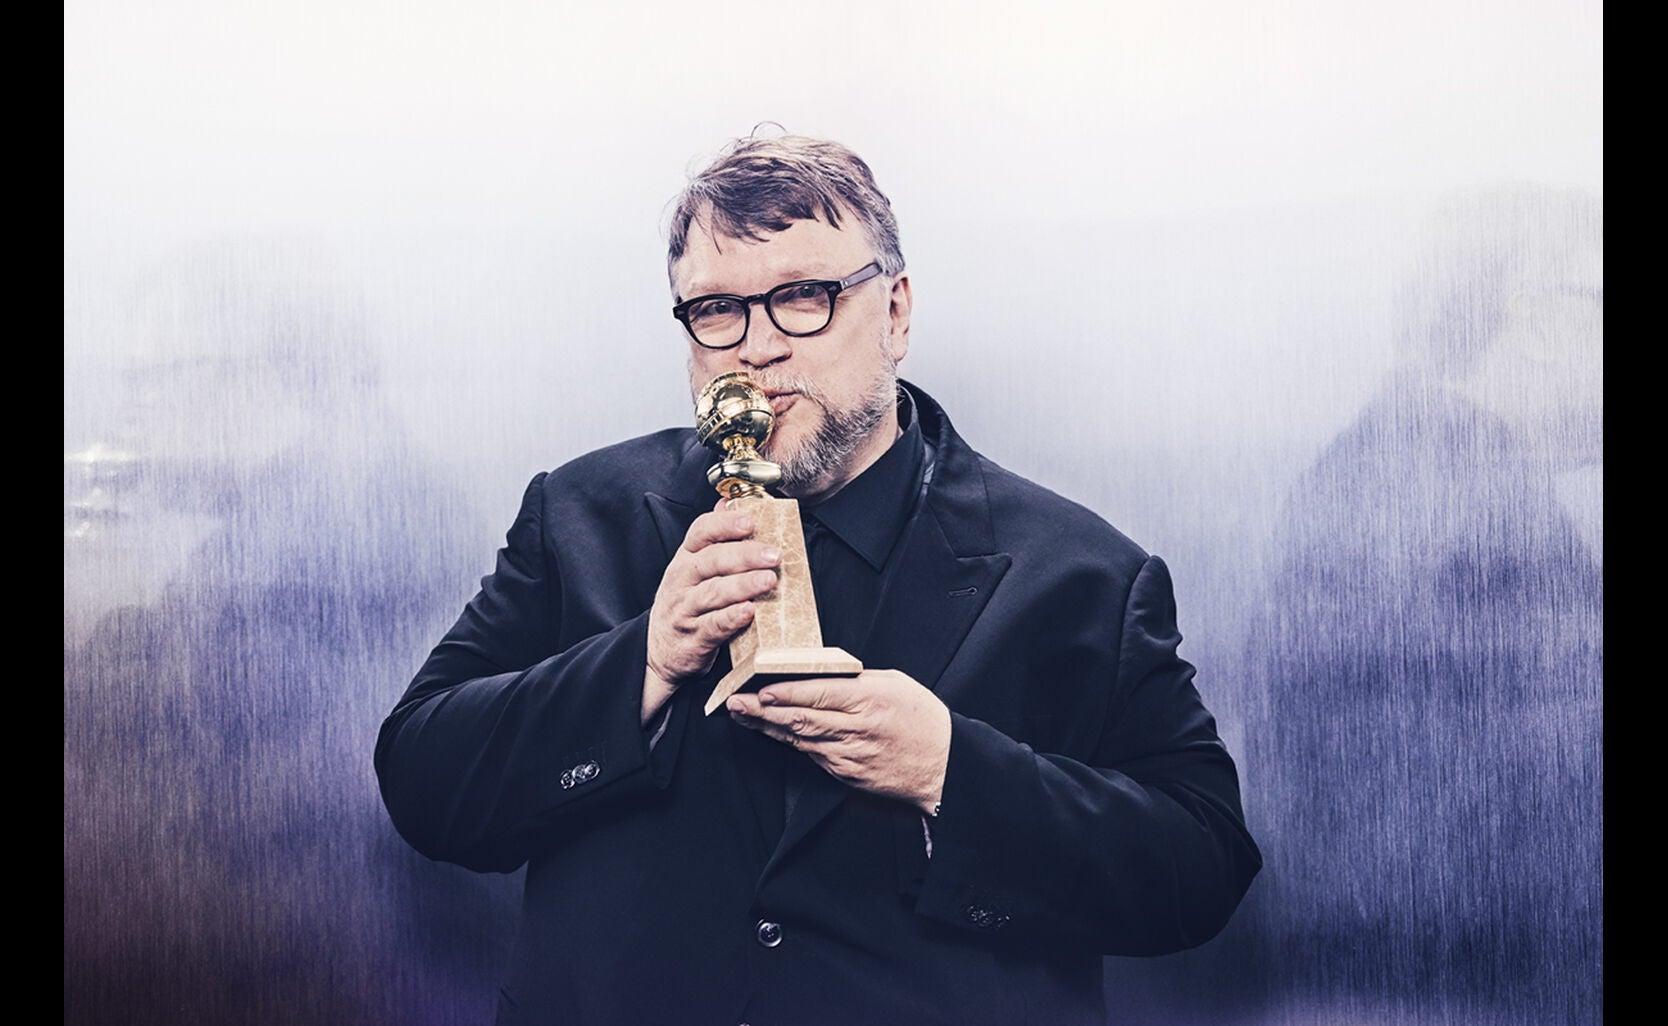 Guillermo del Toro, Best Director - The Shape of Water